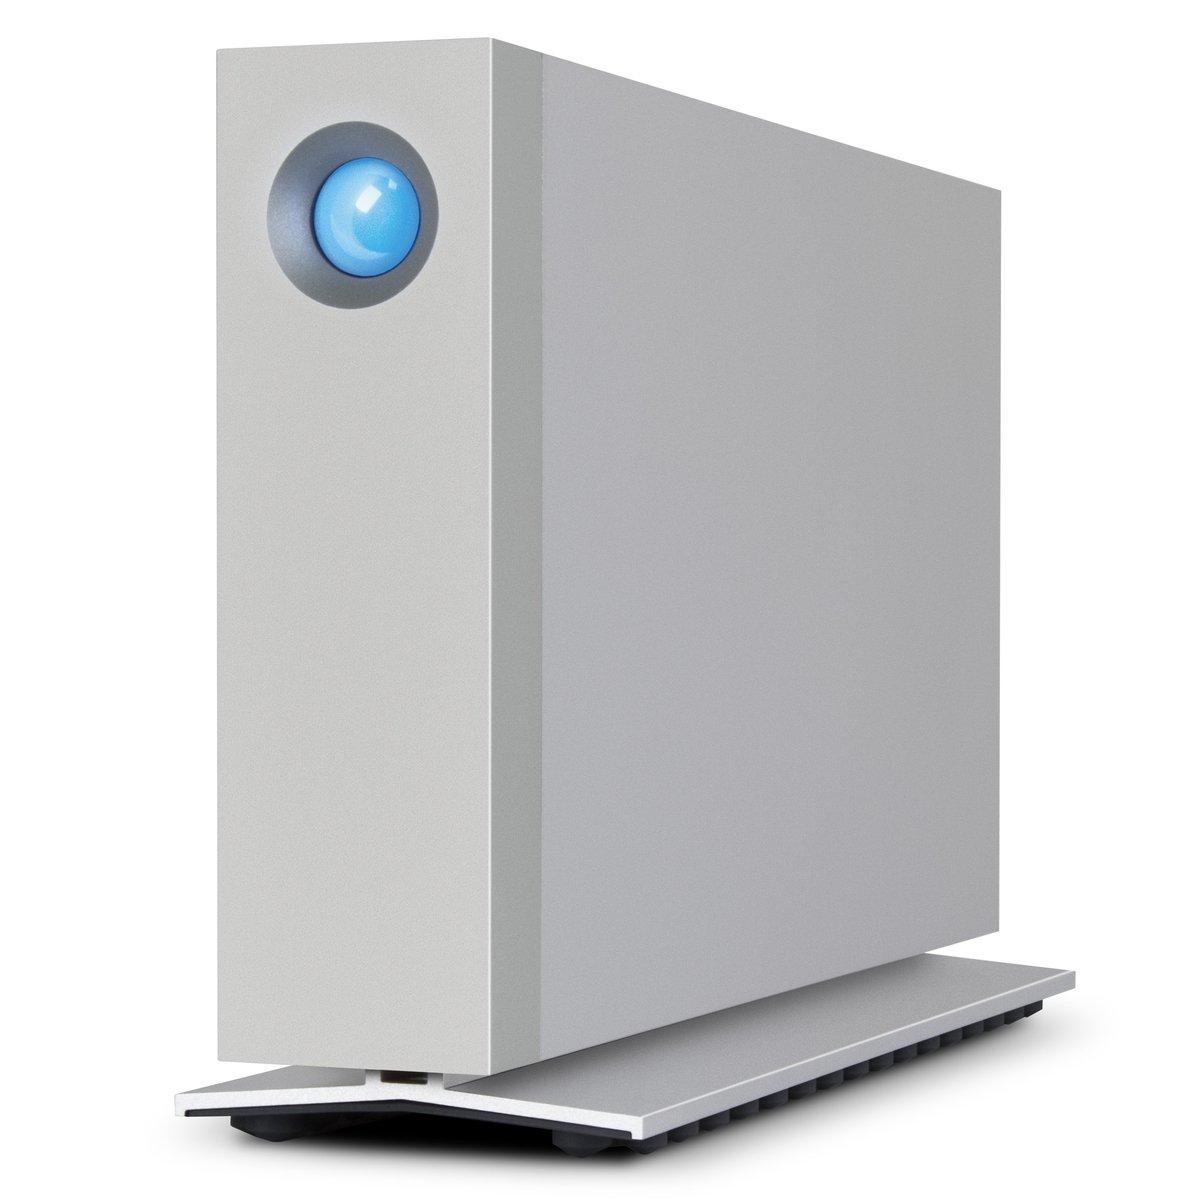 LaCie d2 Thunderbolt 3, 6TB USB 3.1 External Hard Drive (STFY6000400)